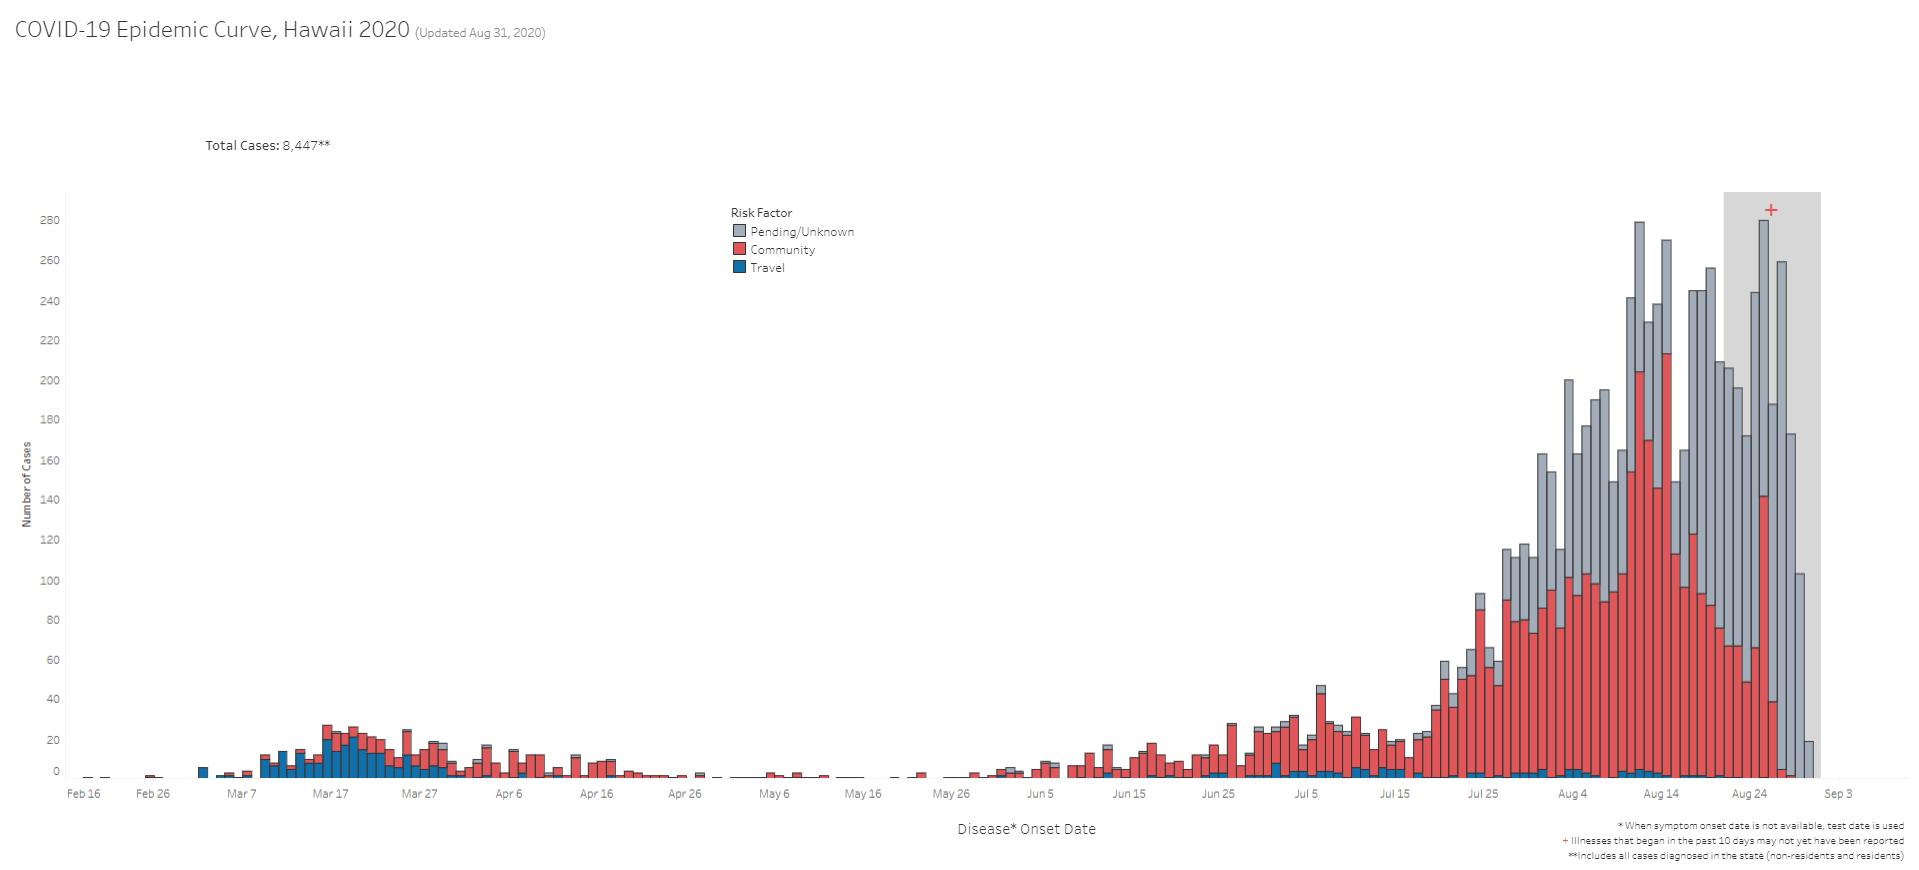 COVID-19 Epidemic Curve Hawaii August 31, 2020